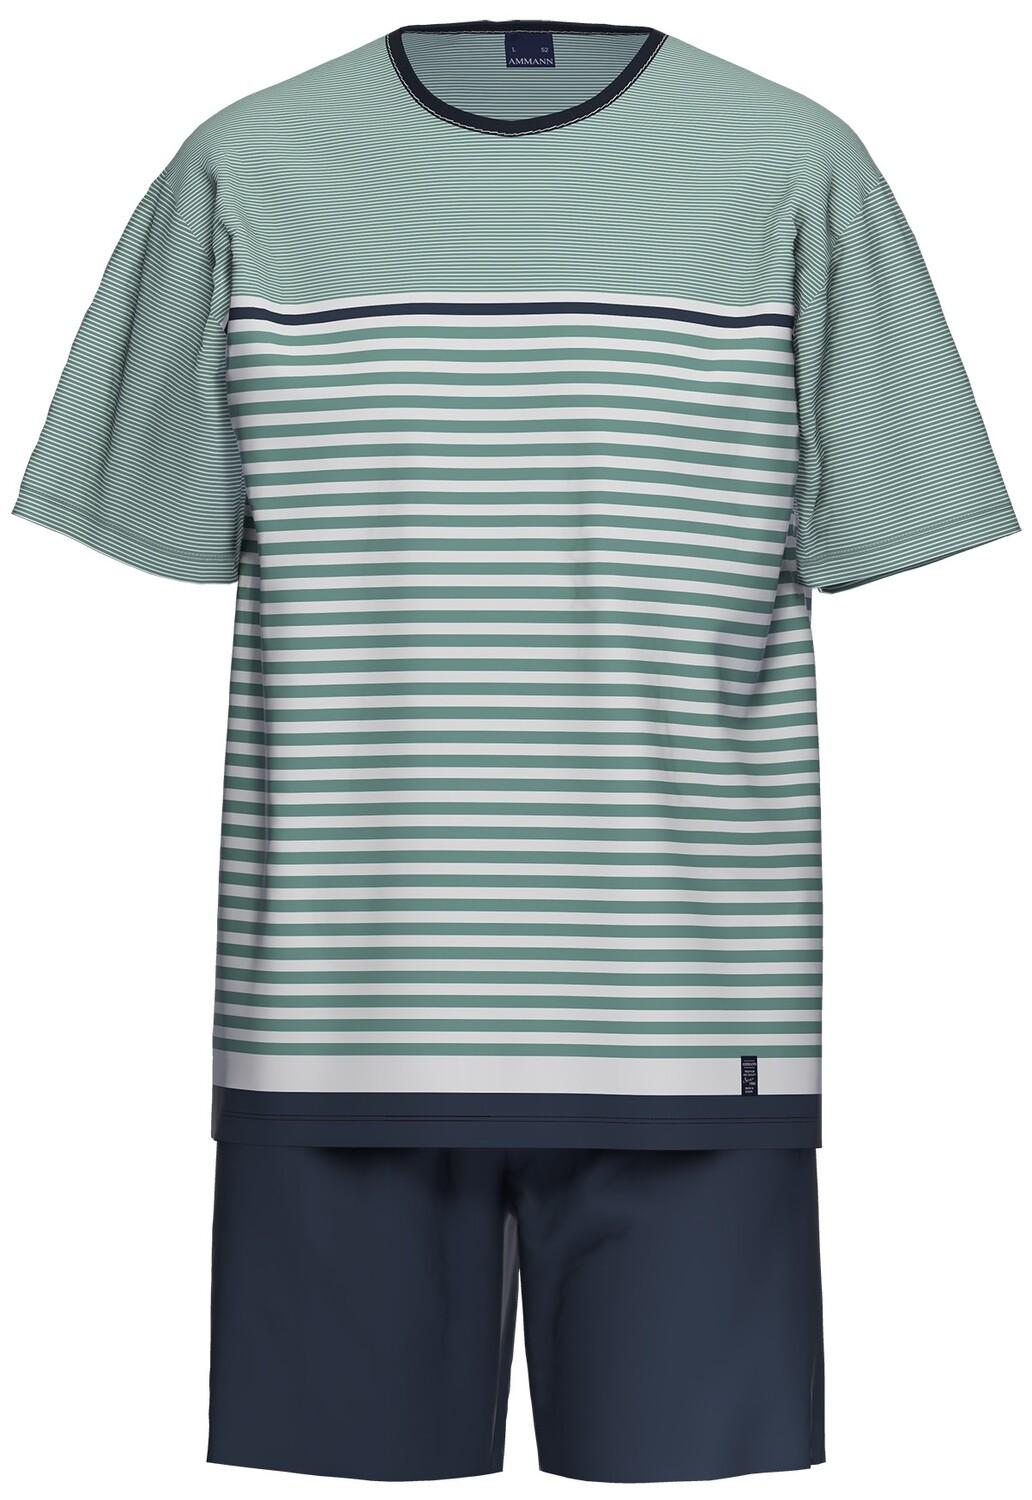 Ammann Heren Pyjama: Korte mouw / Short